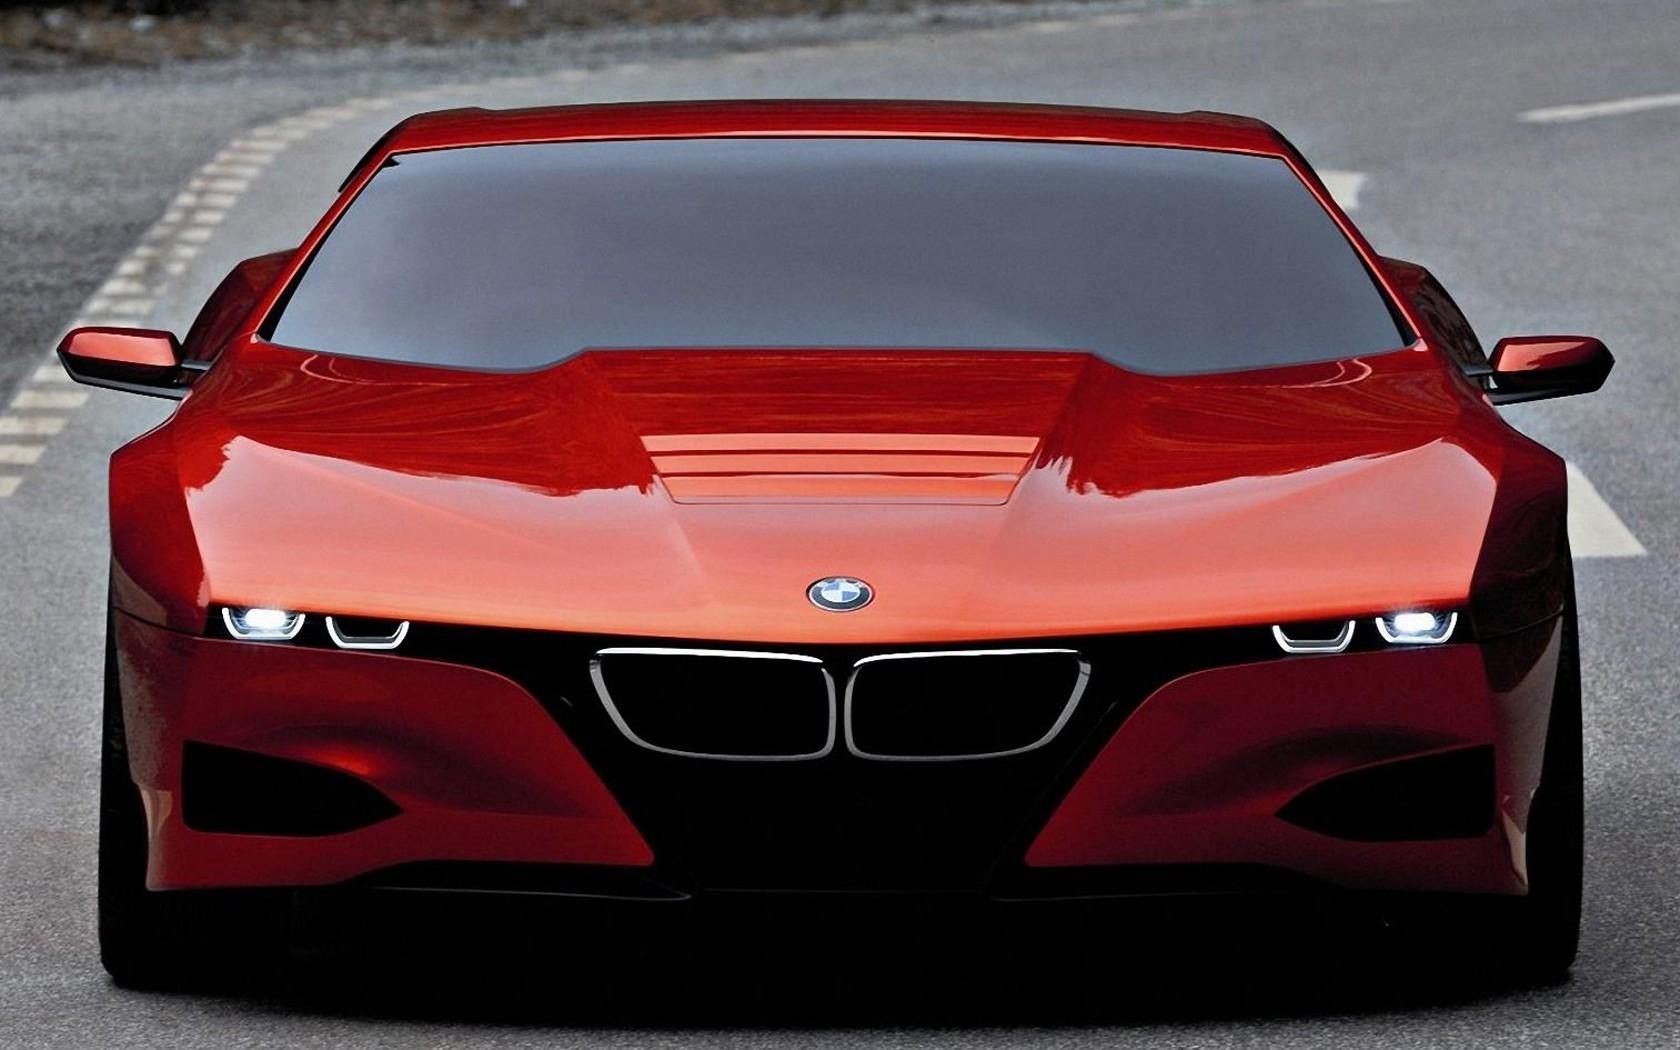 Bmw Futuristic Concept Art Cars Sports Orange M1 Future Wallpaper 1680x1050 188835 Wallpaperup